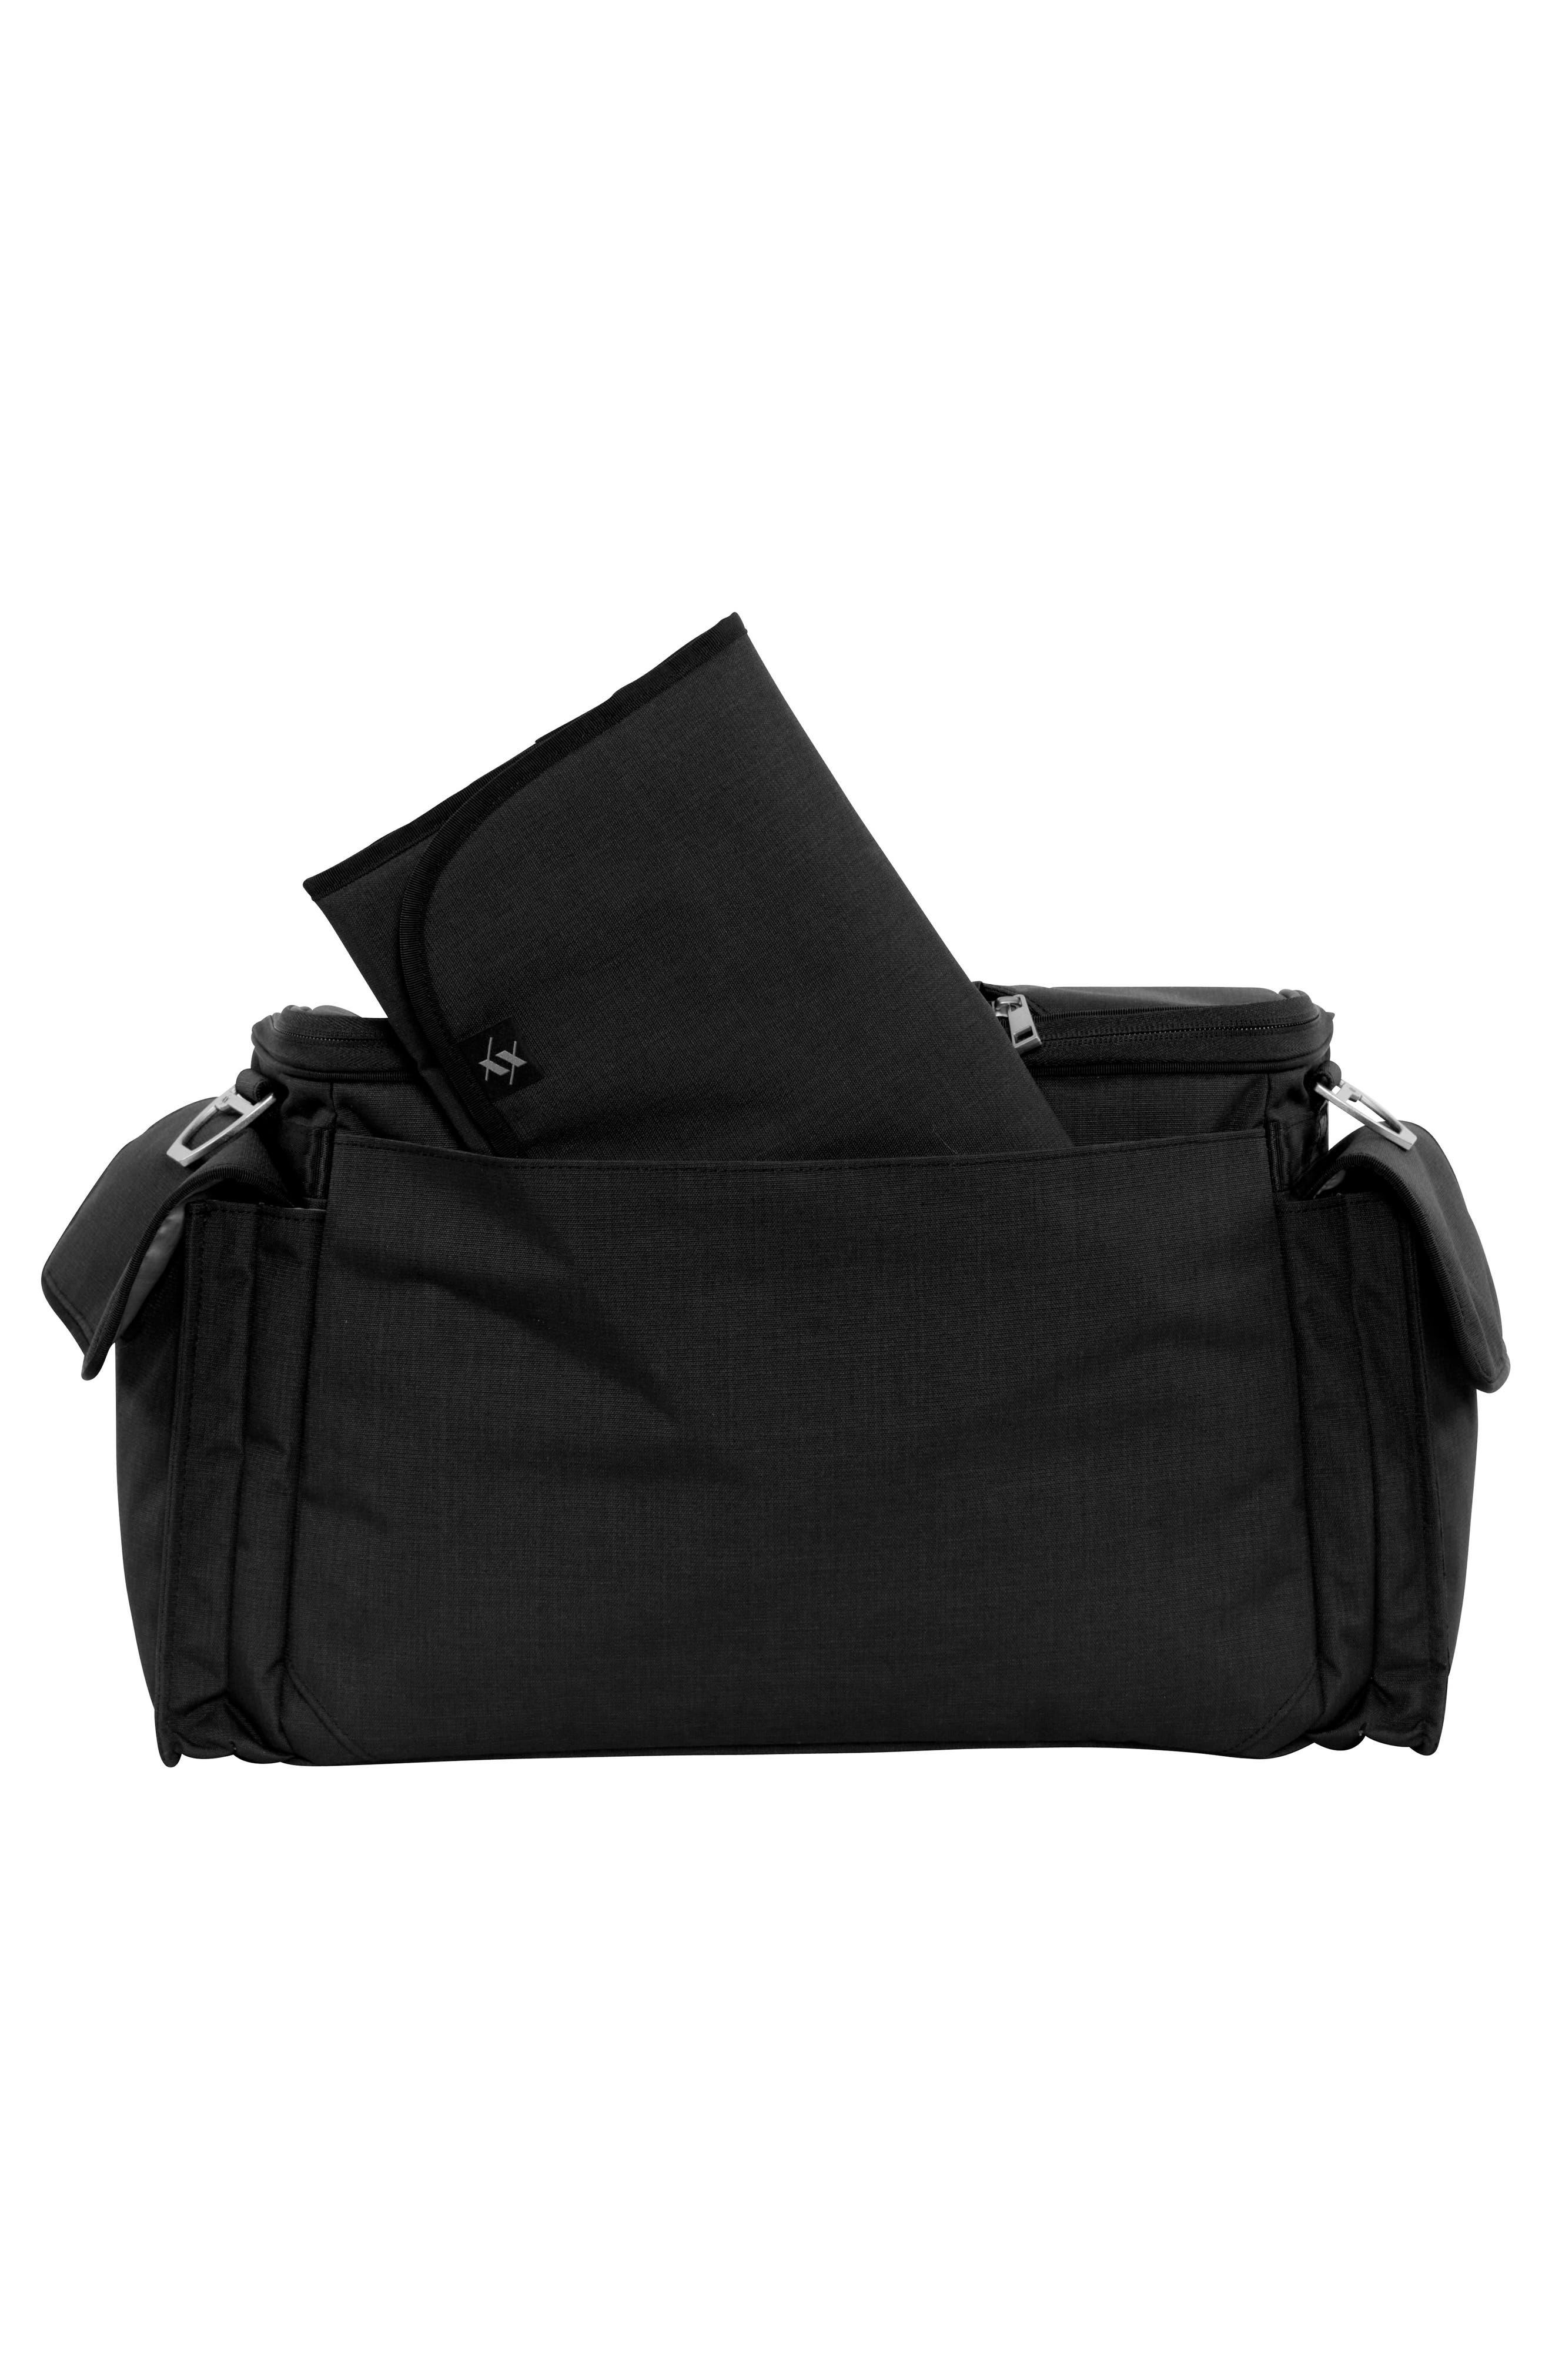 XY Clone Diaper Bag,                             Alternate thumbnail 4, color,                             CARBON